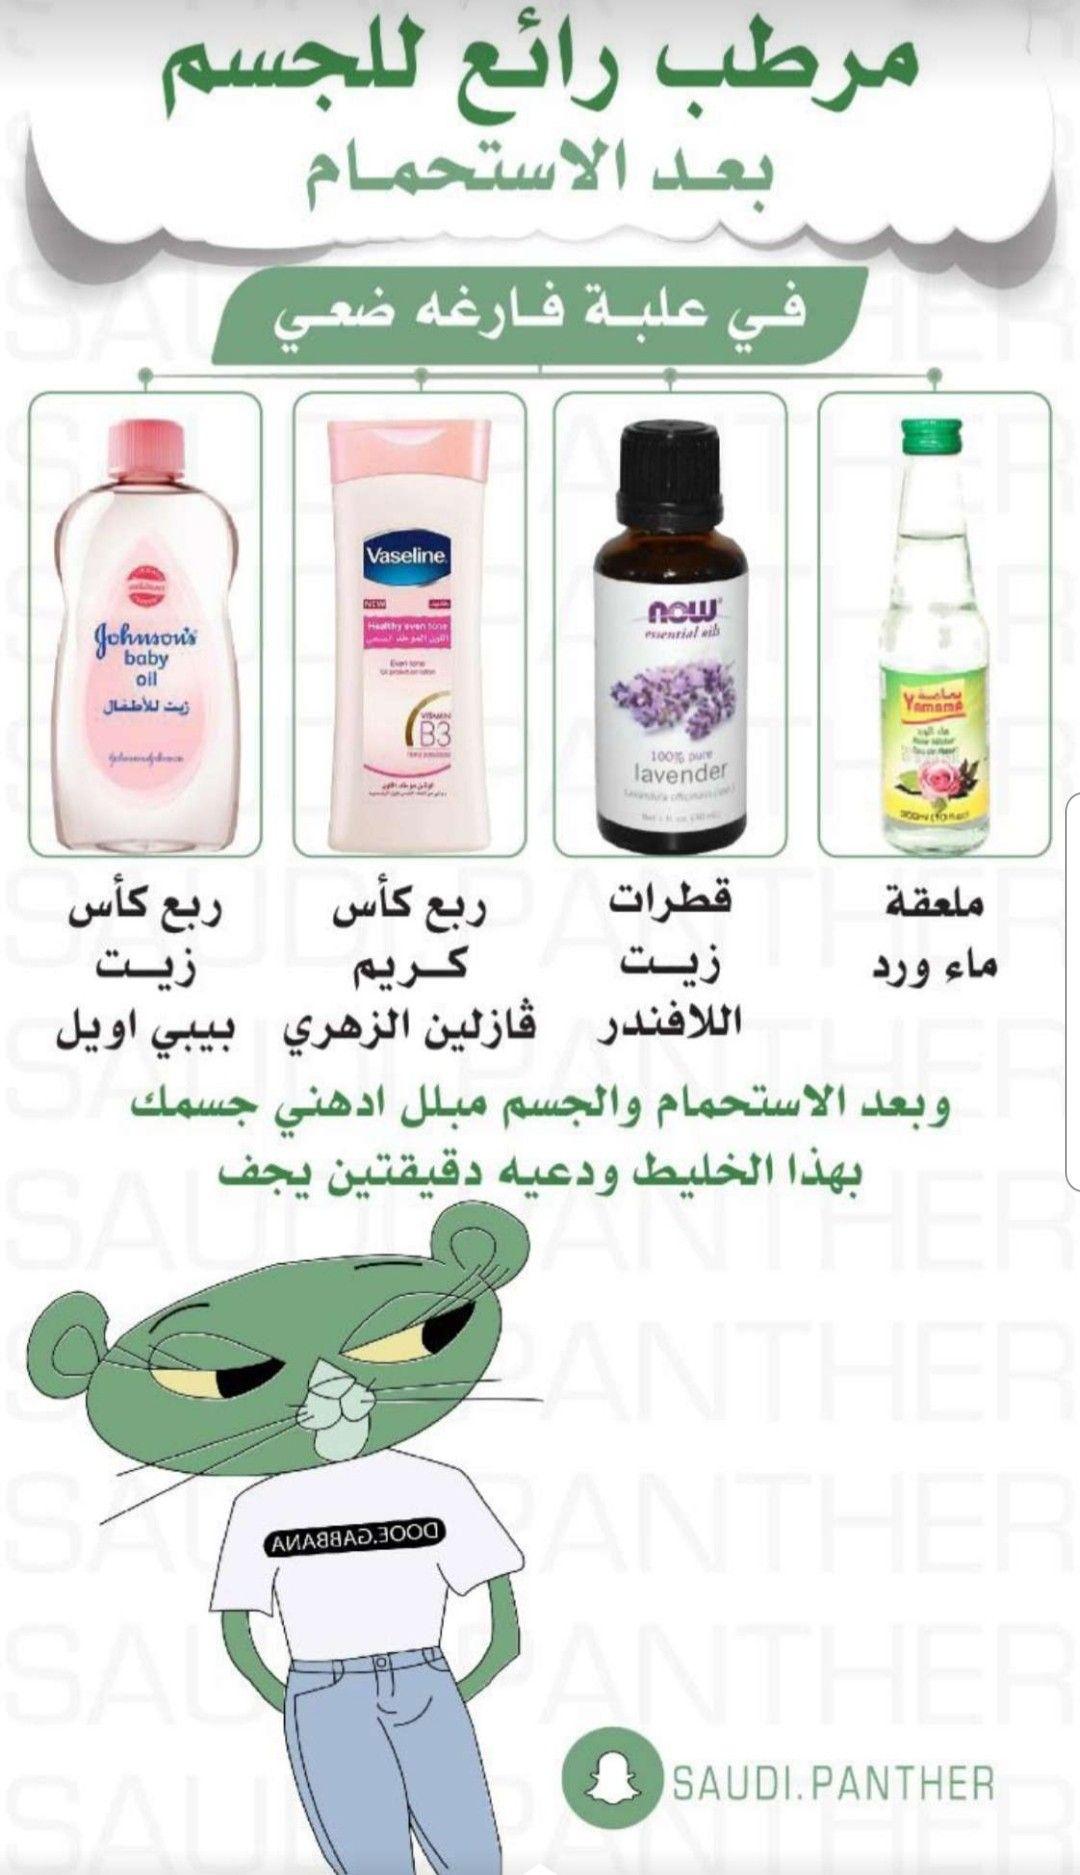 Pin By Taefnasser On شموخ Facial Skin Care Routine Beauty Skin Care Routine Skin Care Treatments